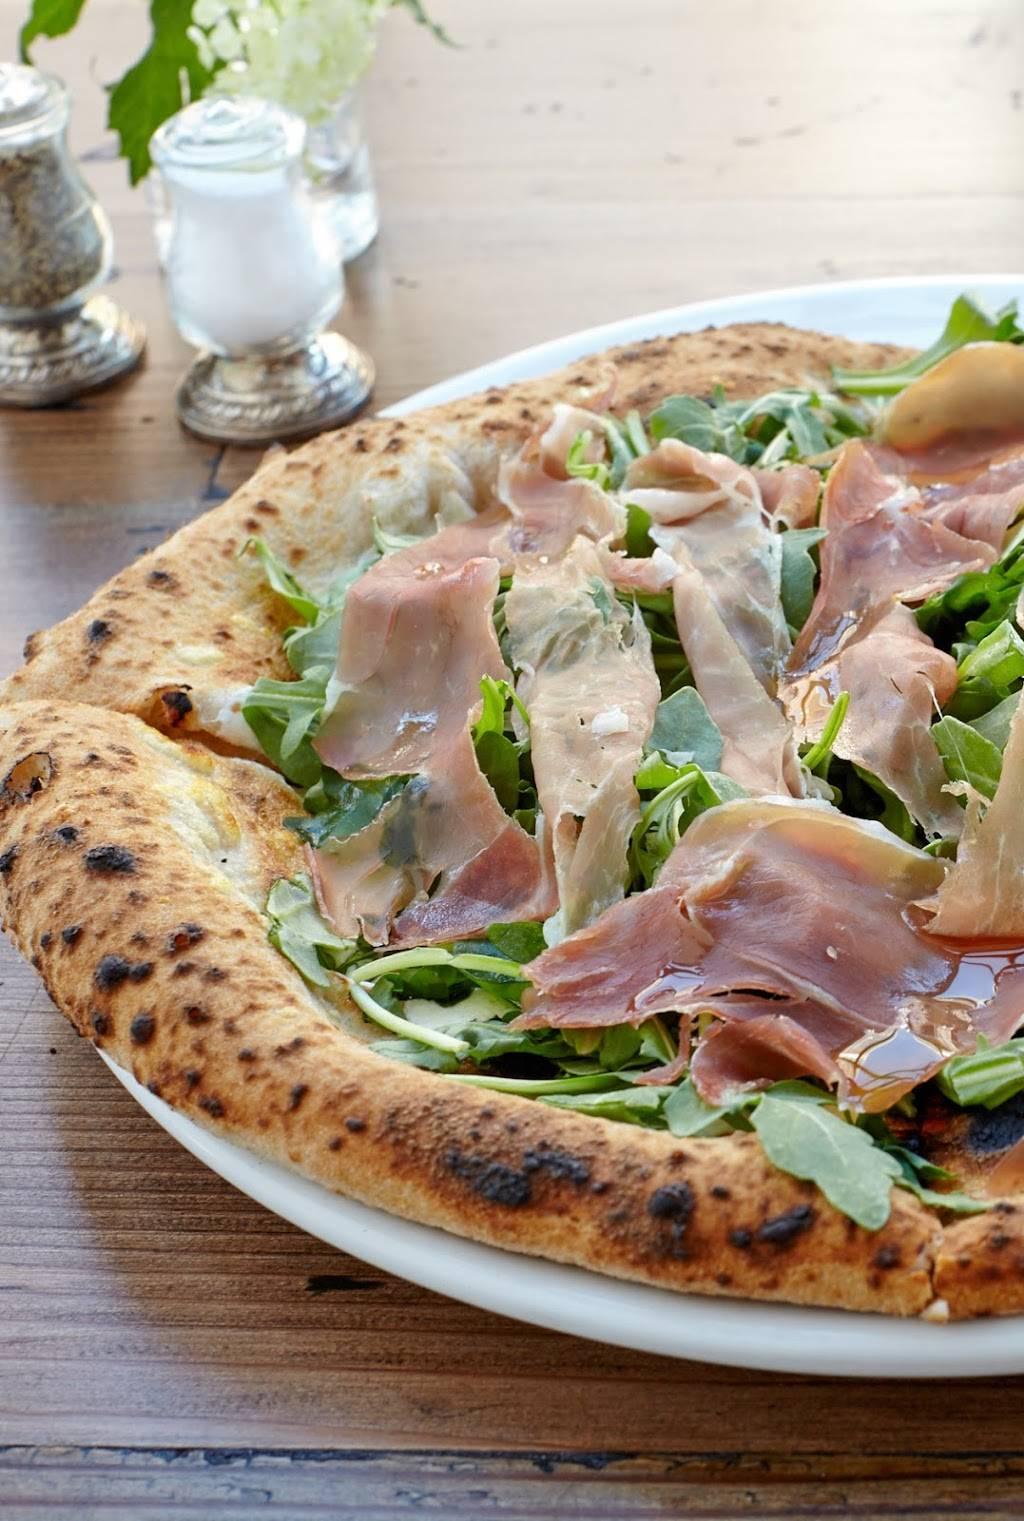 Izzys Pizzeria   restaurant   City Place, 86 The Promenade, Edgewater, NJ 07020, USA   2017952600 OR +1 201-795-2600